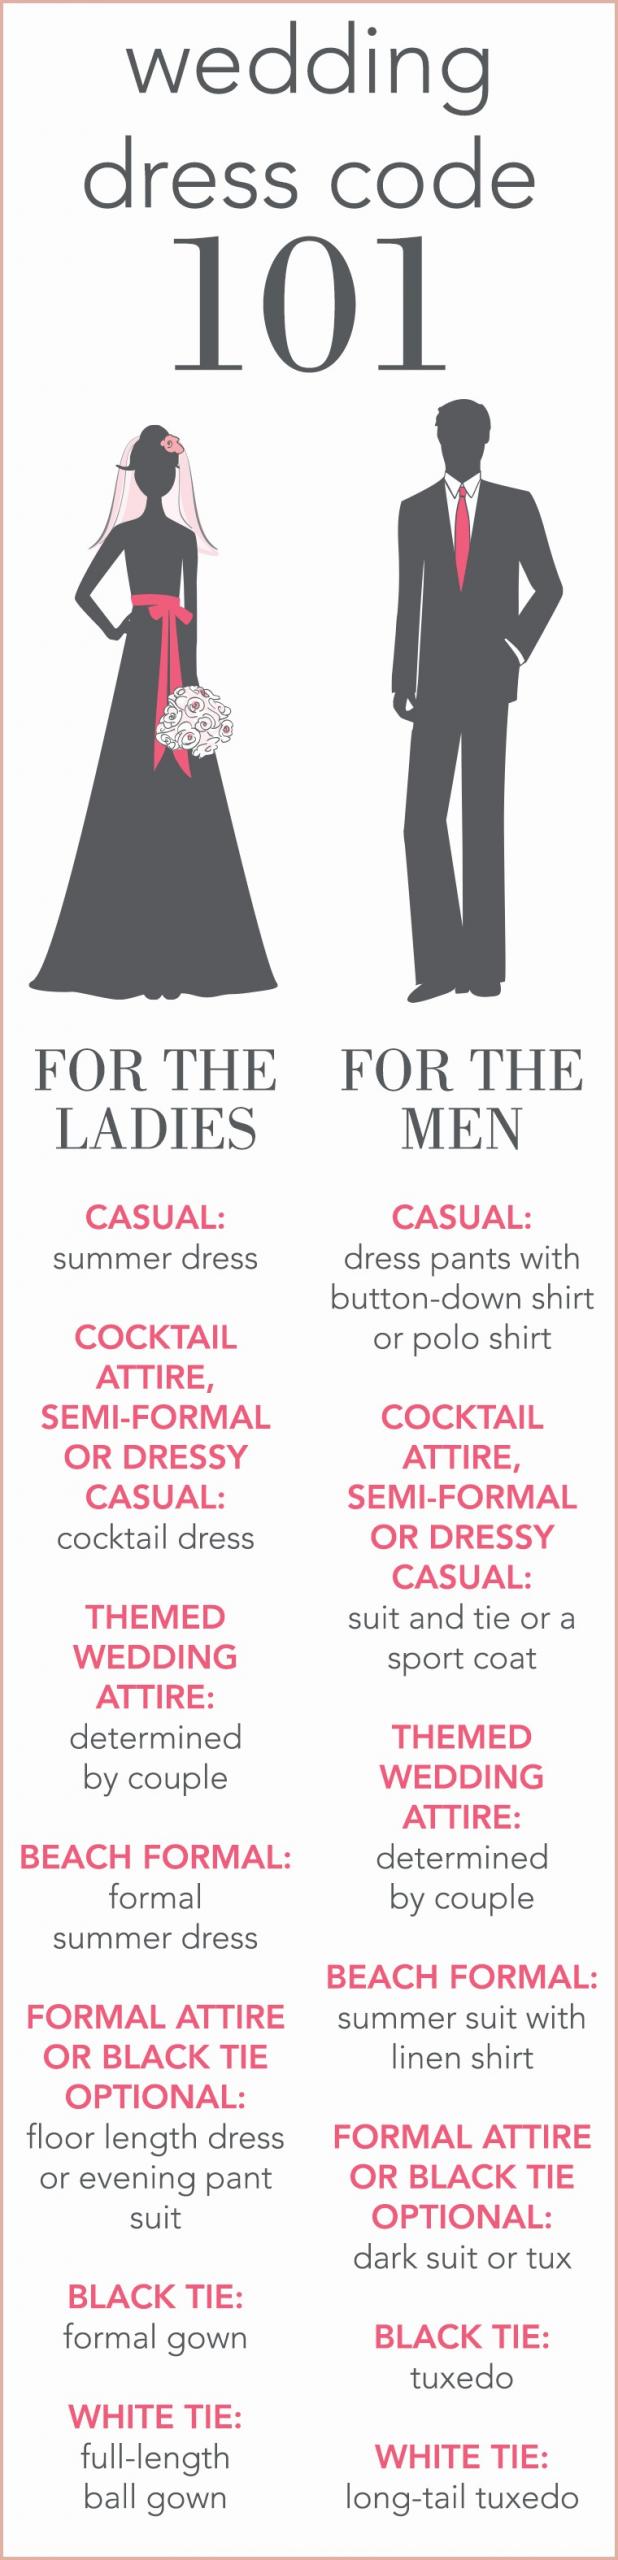 10 Breathtaking Wedding Invitation Dress Code that Prove